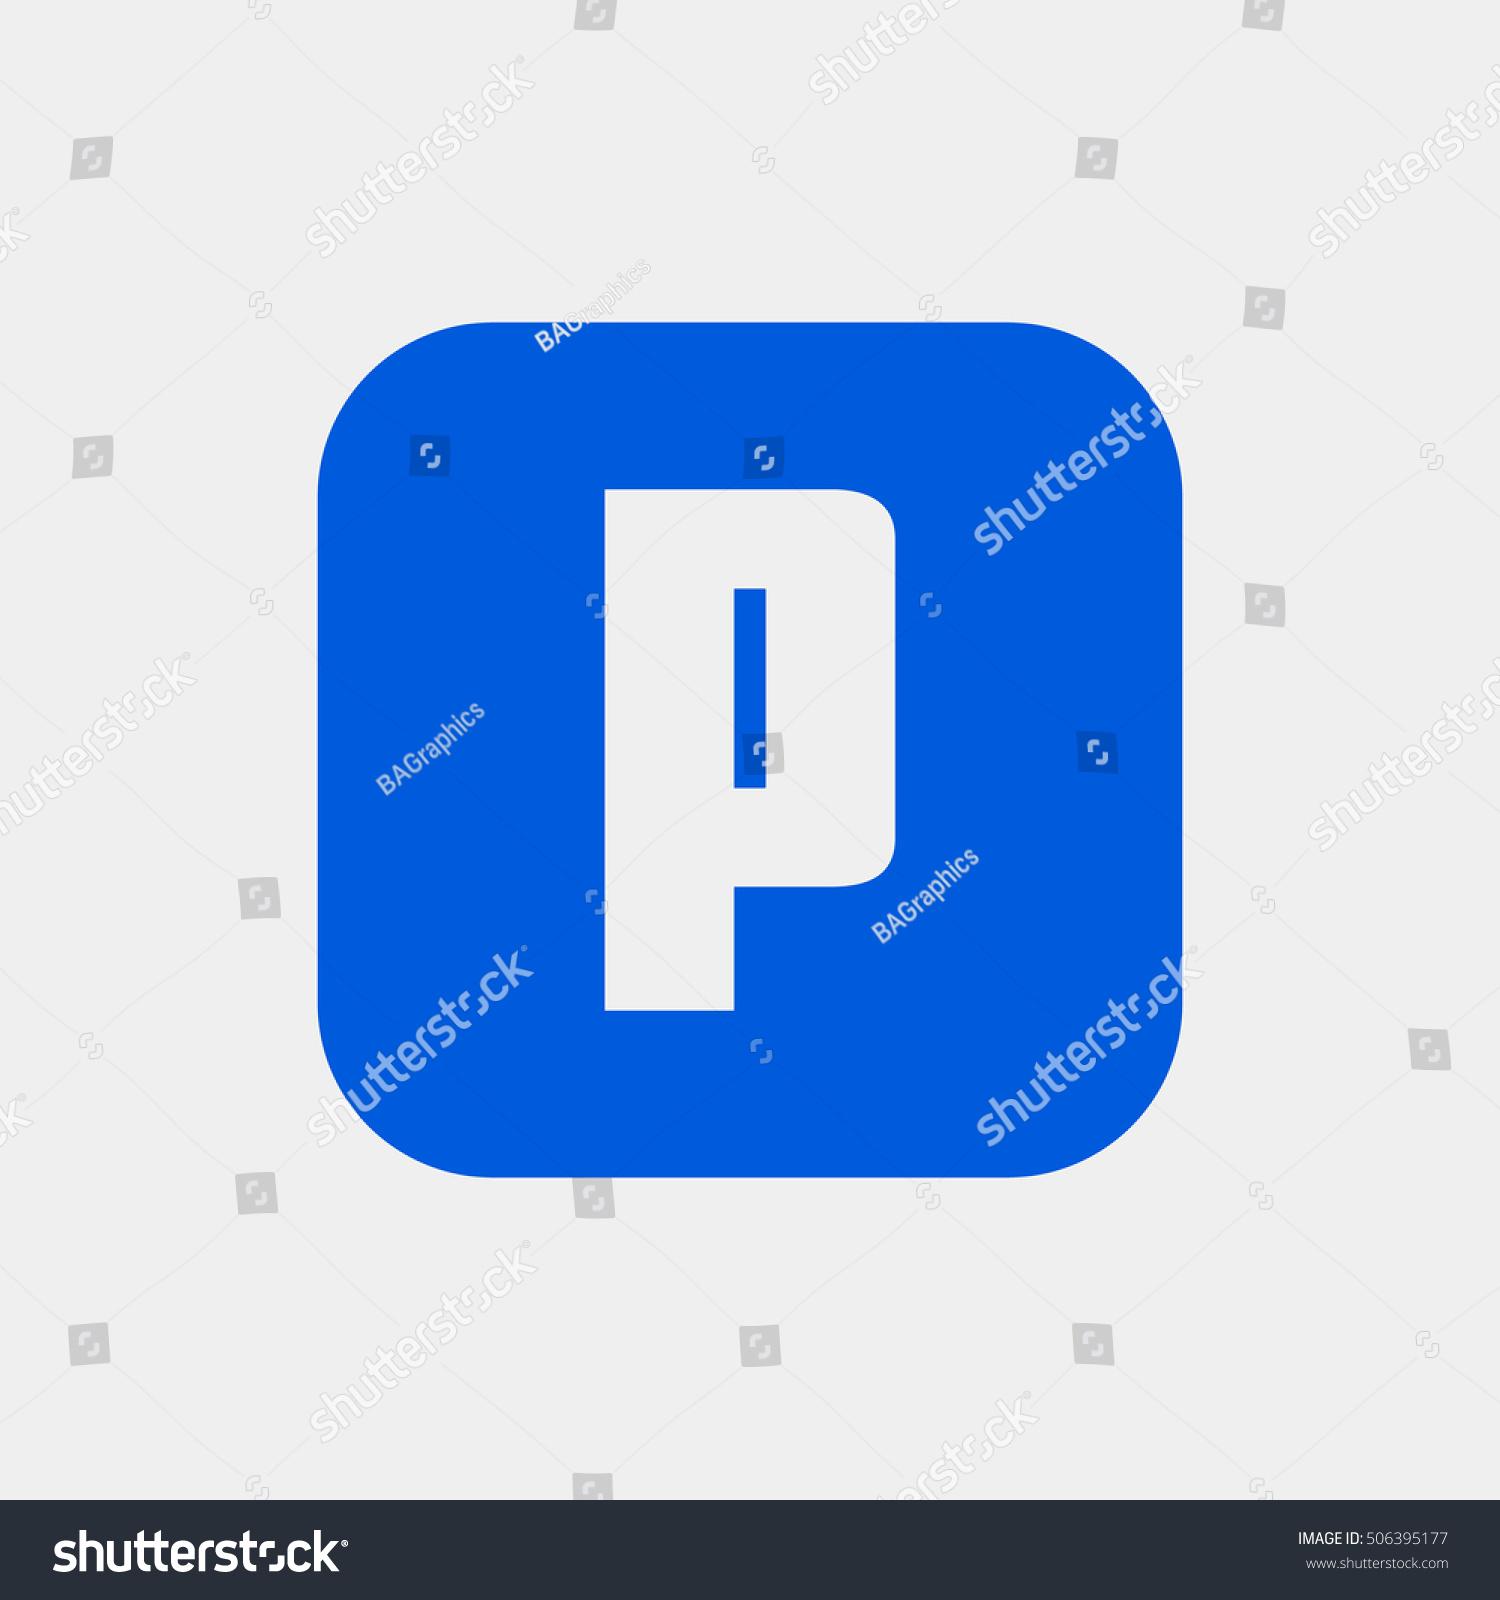 Letter p vector logo useful branding stock vector 506395177 letter p vector logo useful as branding symbol identity alphabet element biocorpaavc